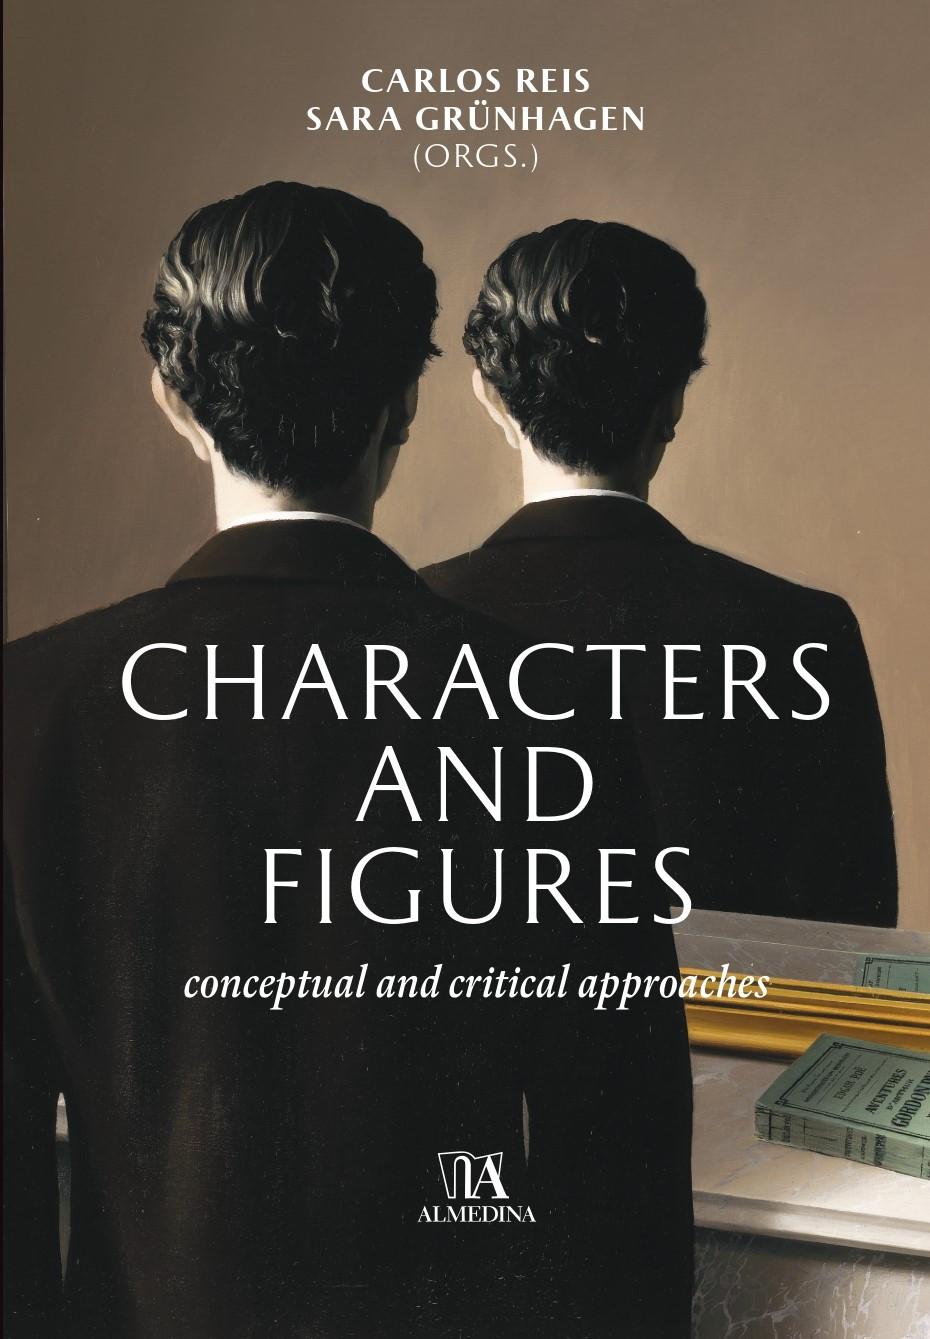 C. Reis, S. Grünhagen (dir.), Characters and Figures: Conceptual and Critical Approaches